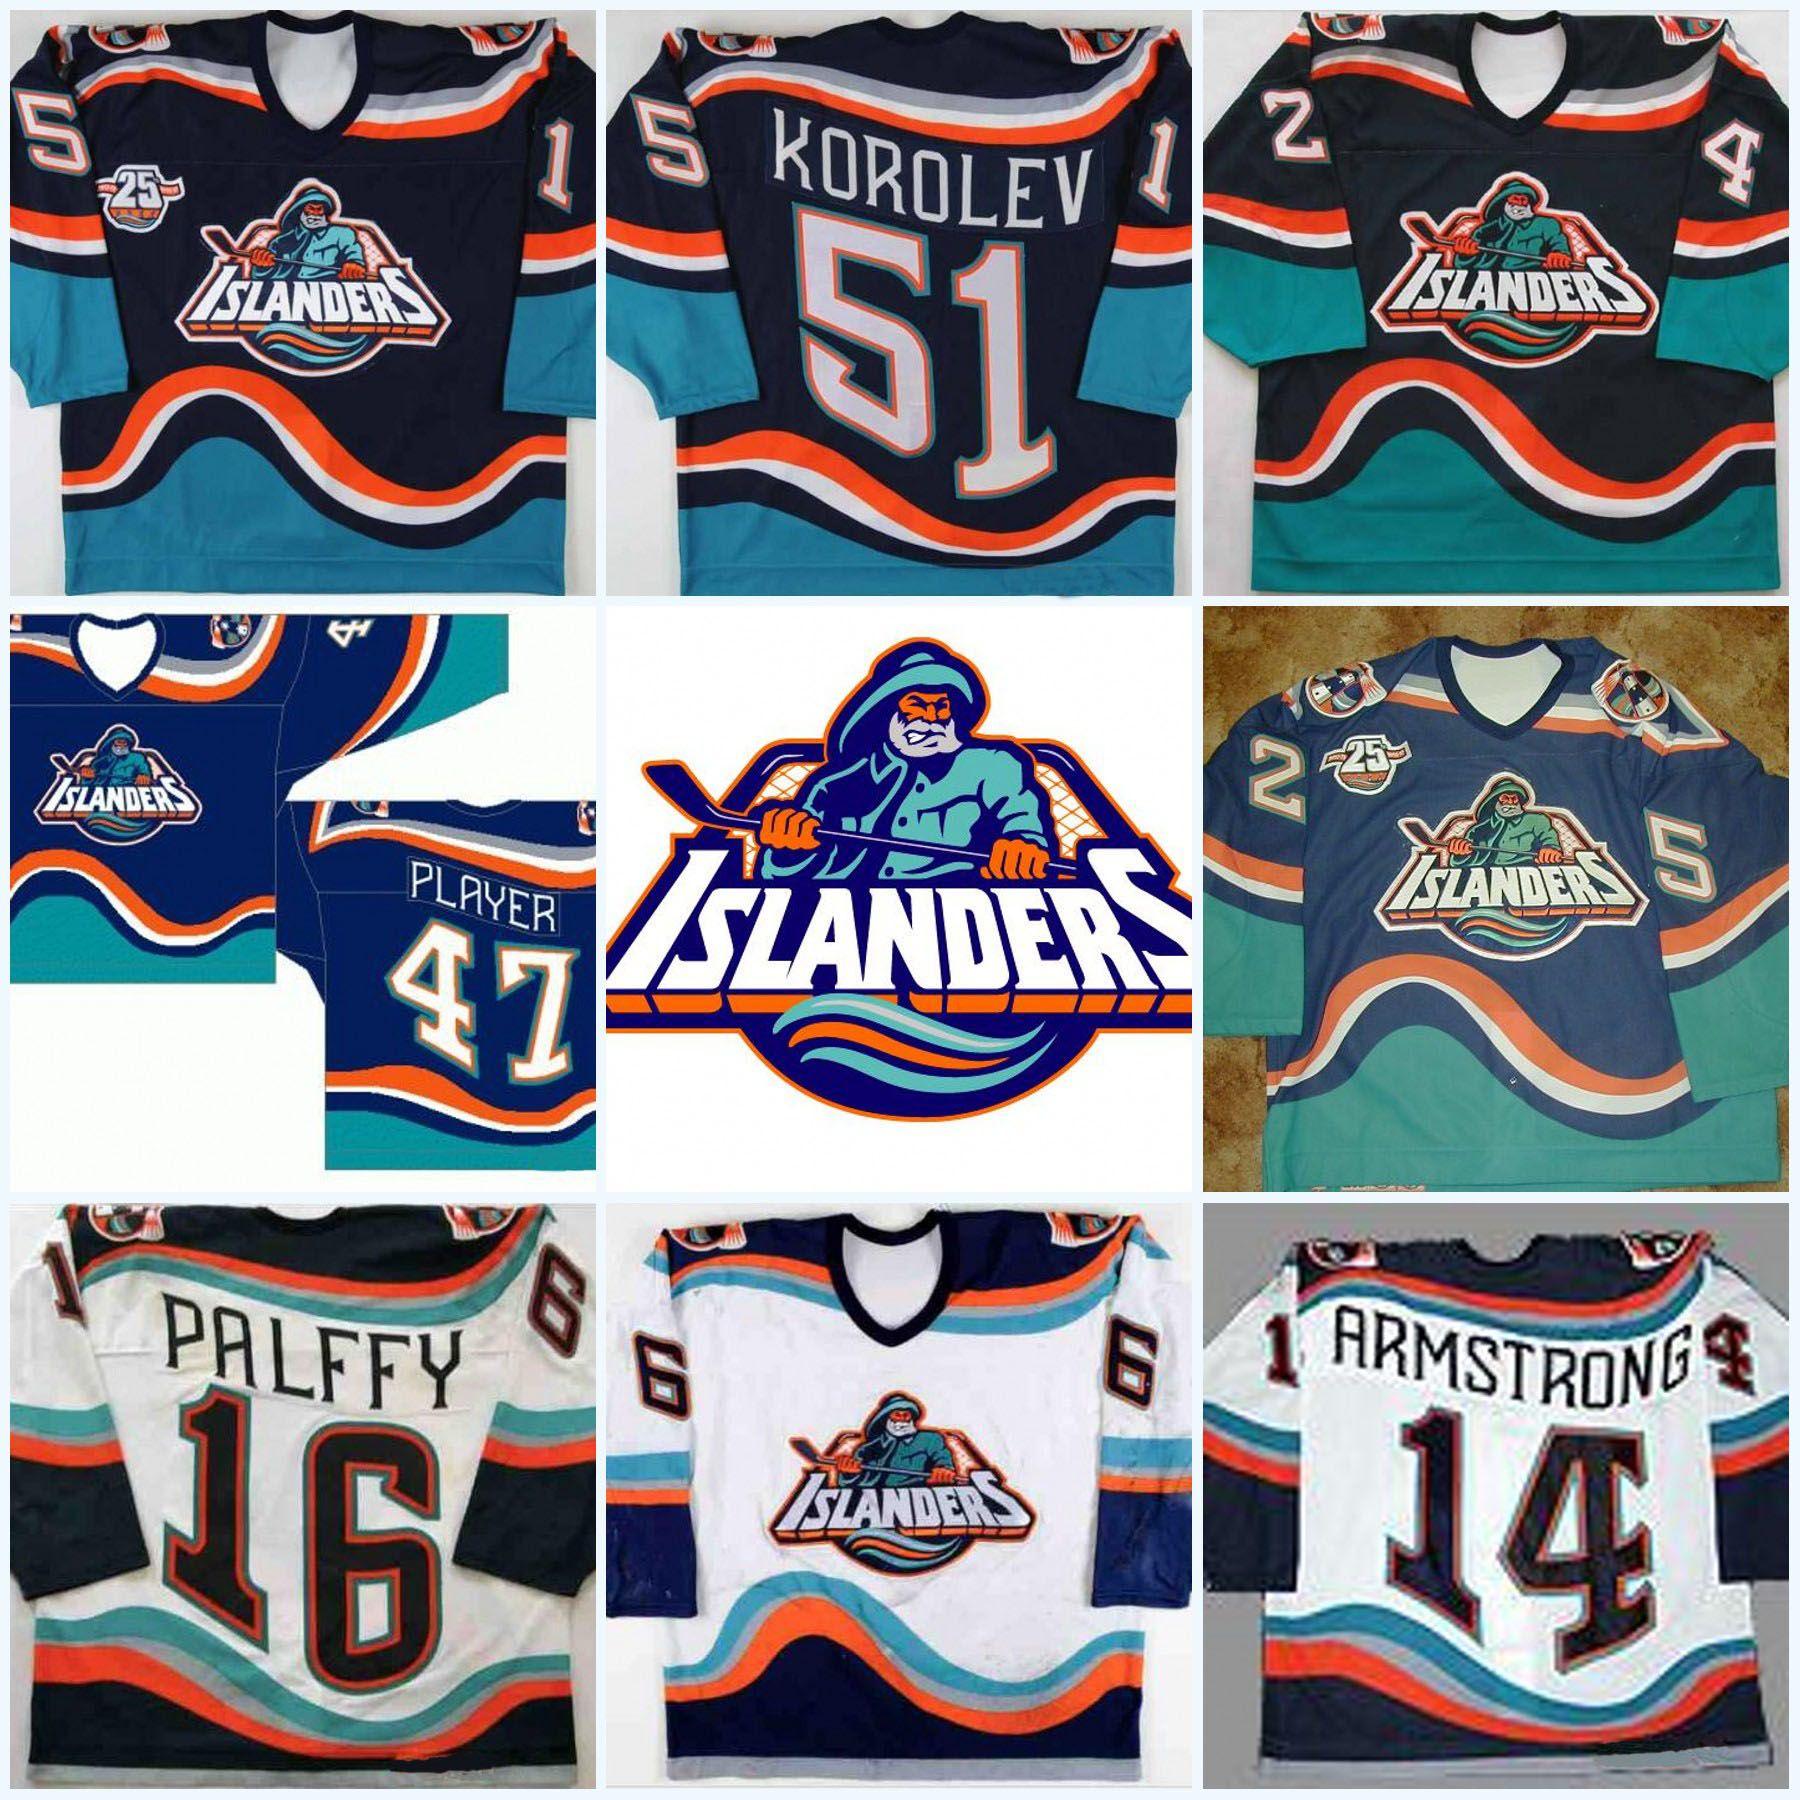 competitive price 47651 771a7 #16 Ziggy Palffy New York Islanders Fisherman Darius Kasparaitis  JohnTavares Korolev Brent Severyn Berard Vintage Hockey Jerseys